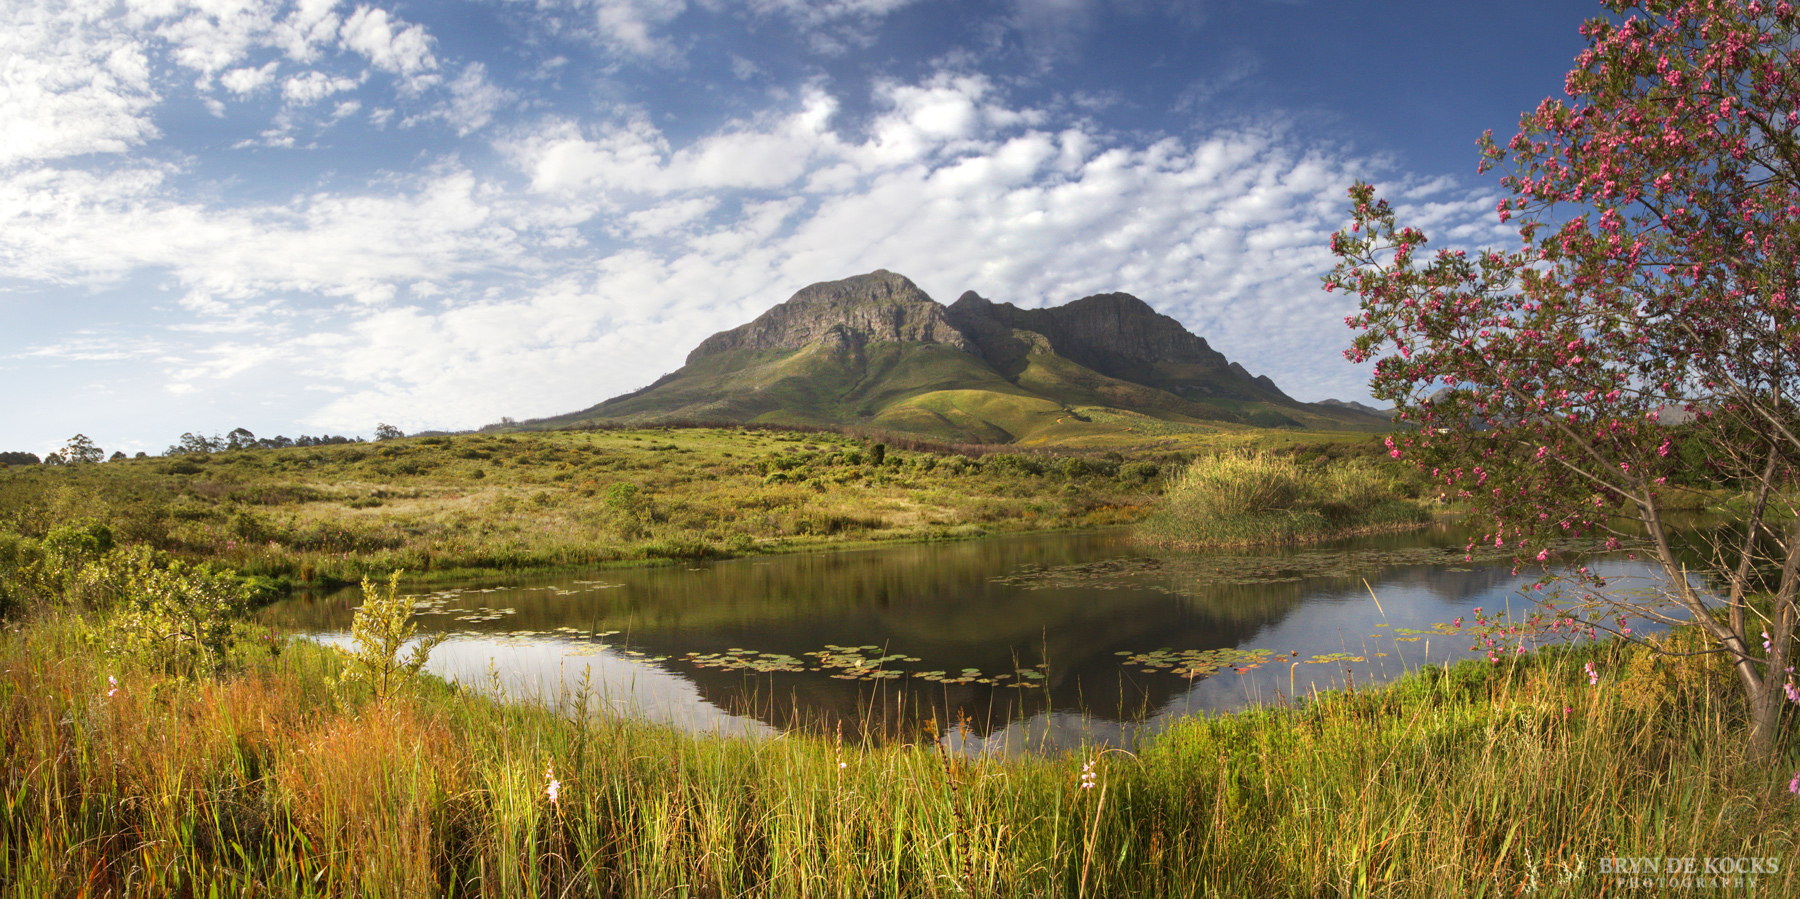 helderberg mountain landscape